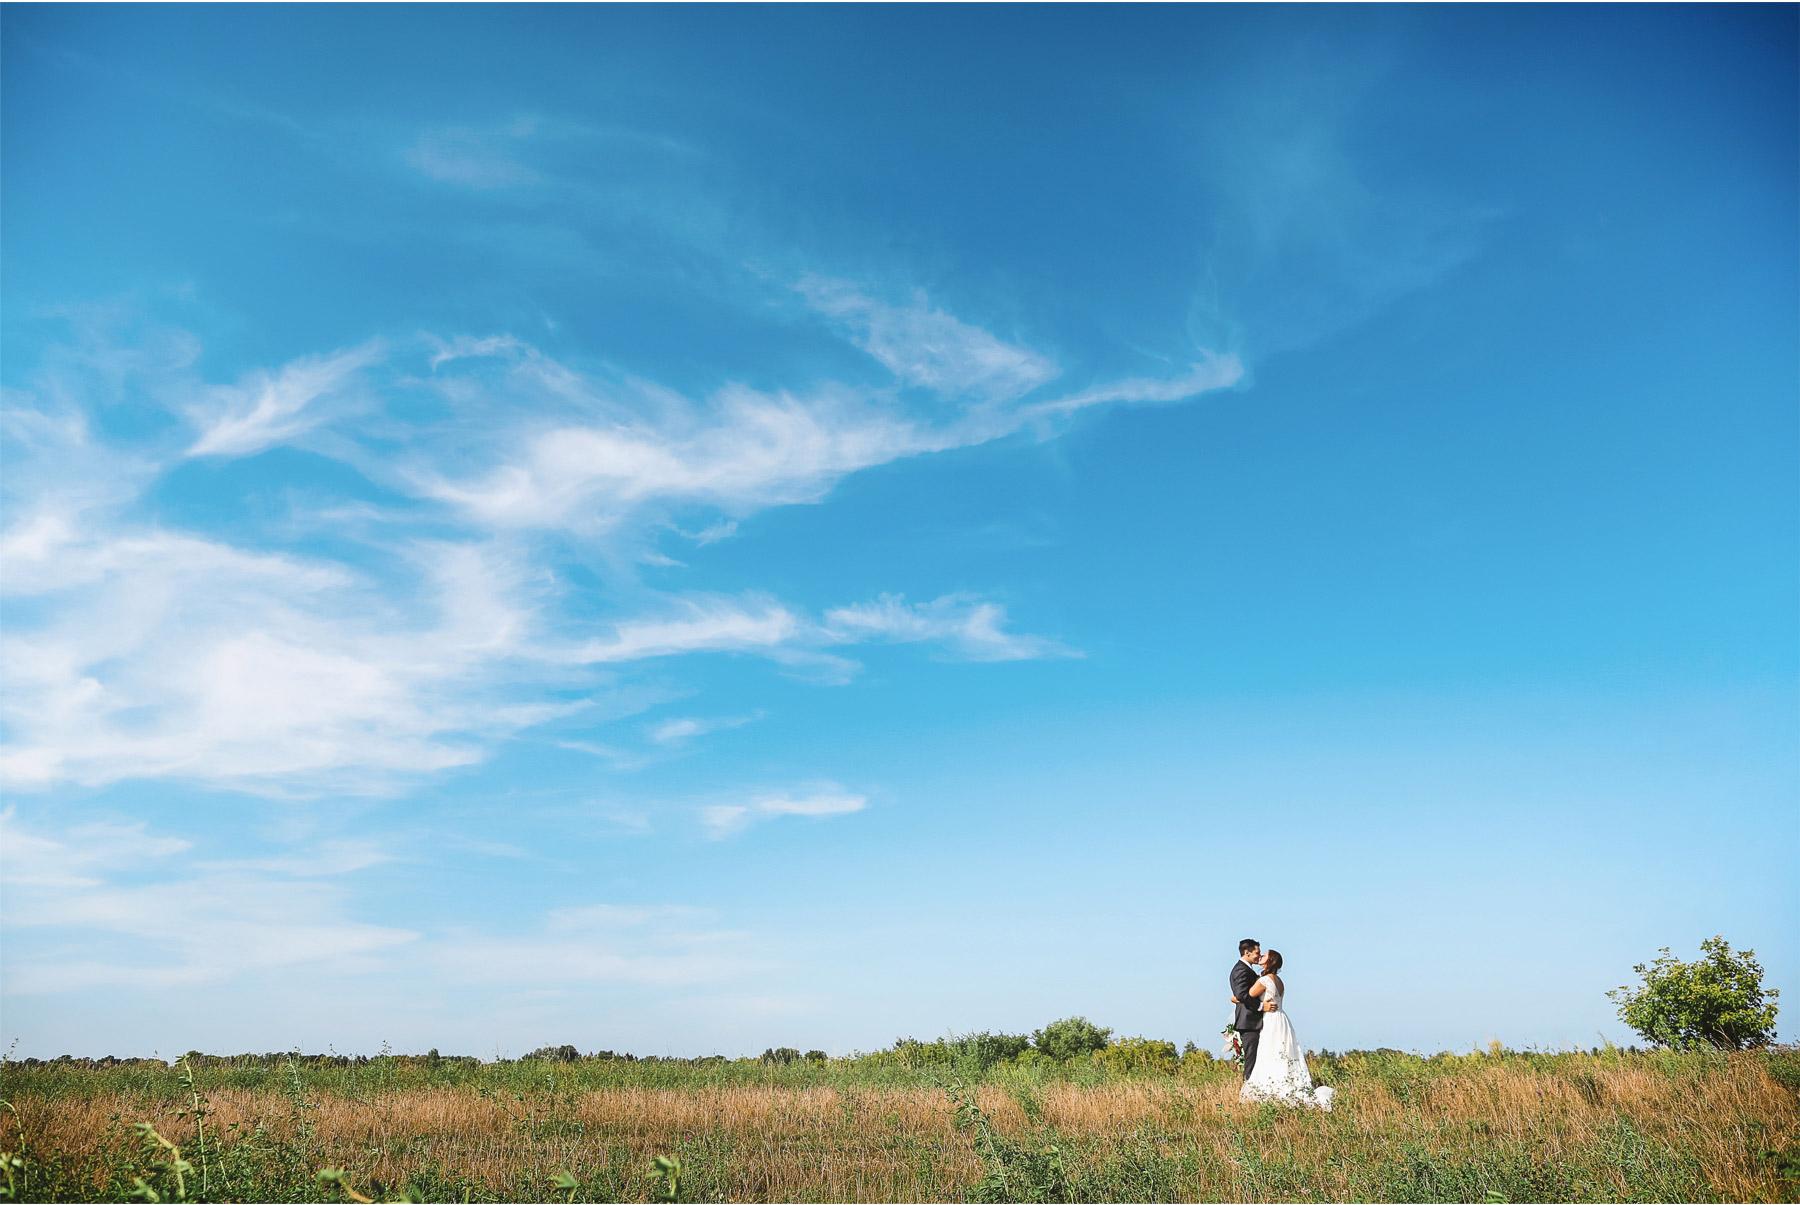 16-Weding-by-Vick-Photography-Minneapolis-Minnesota-Bavaria-Downs-Outdoor-Summer-Bride-Groom-Rebecca-and-Mark.jpg